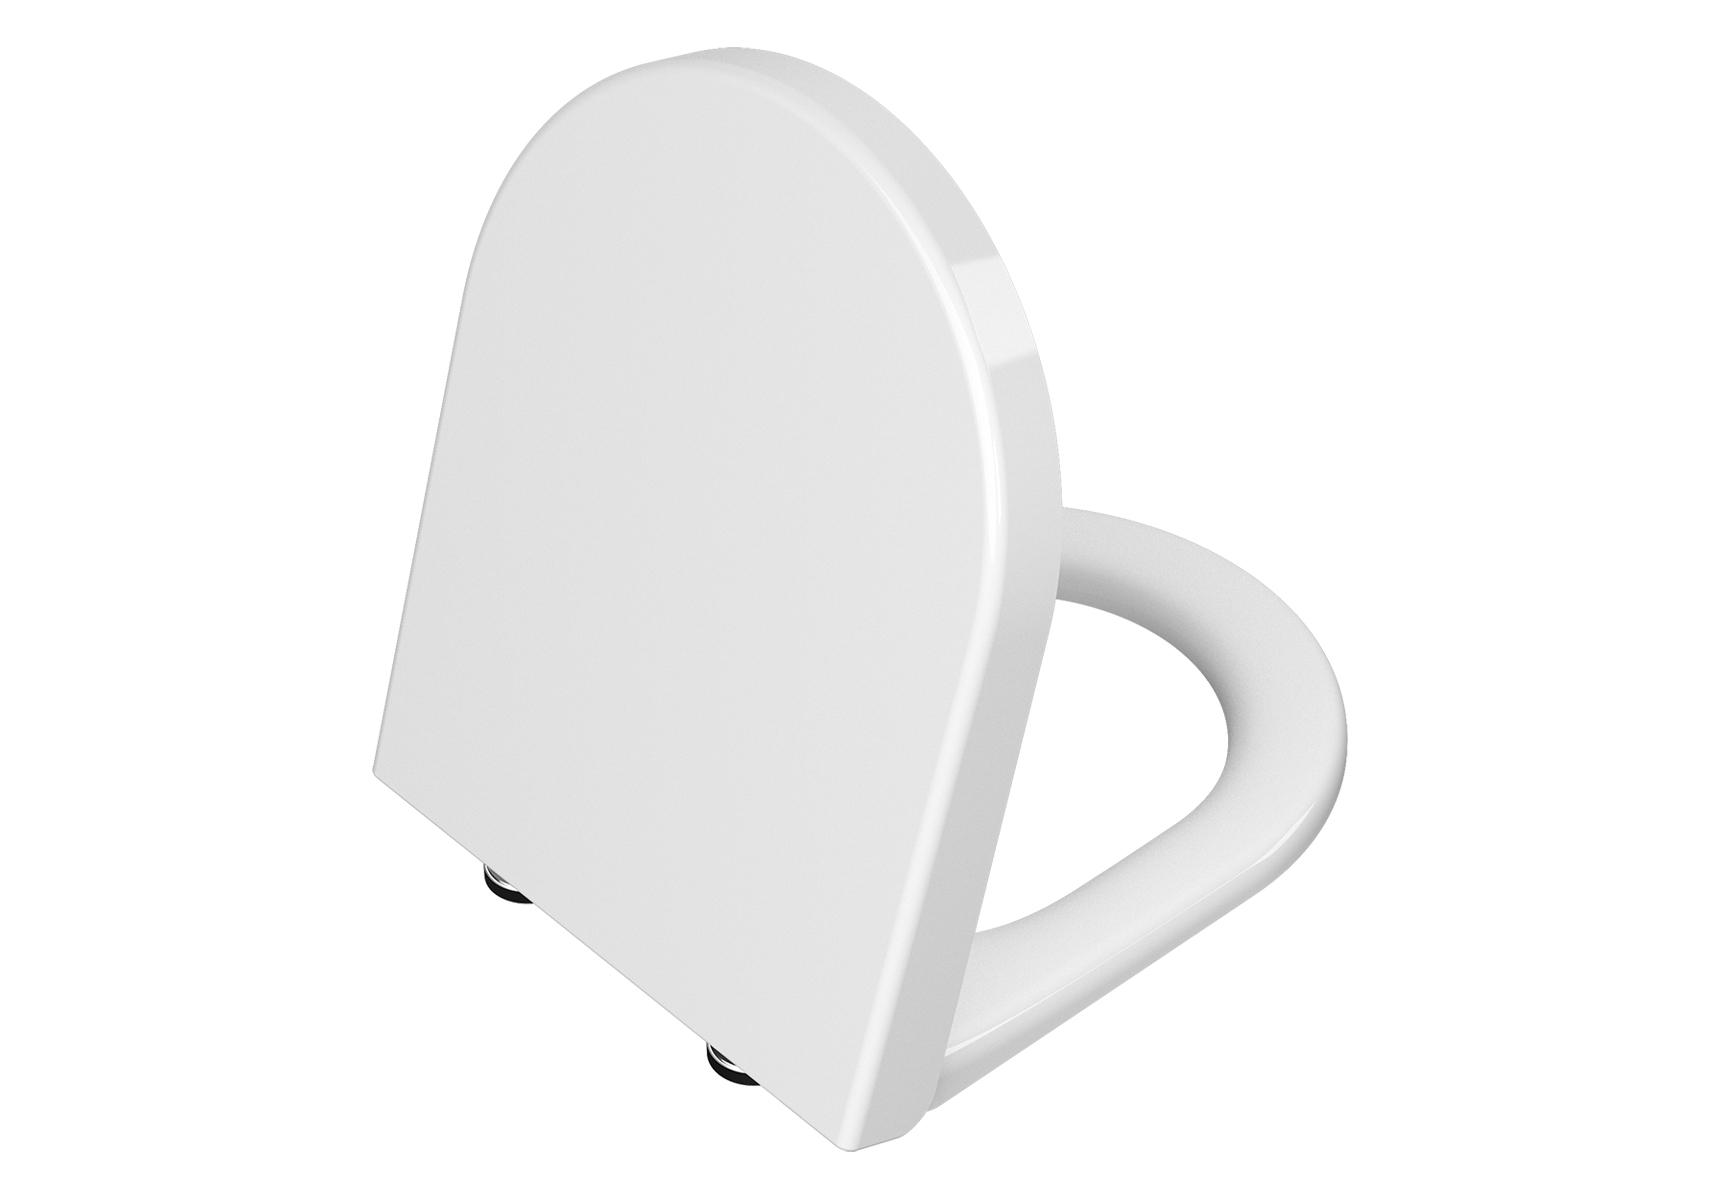 Integra WC-Sitz mit Absenkautomatik